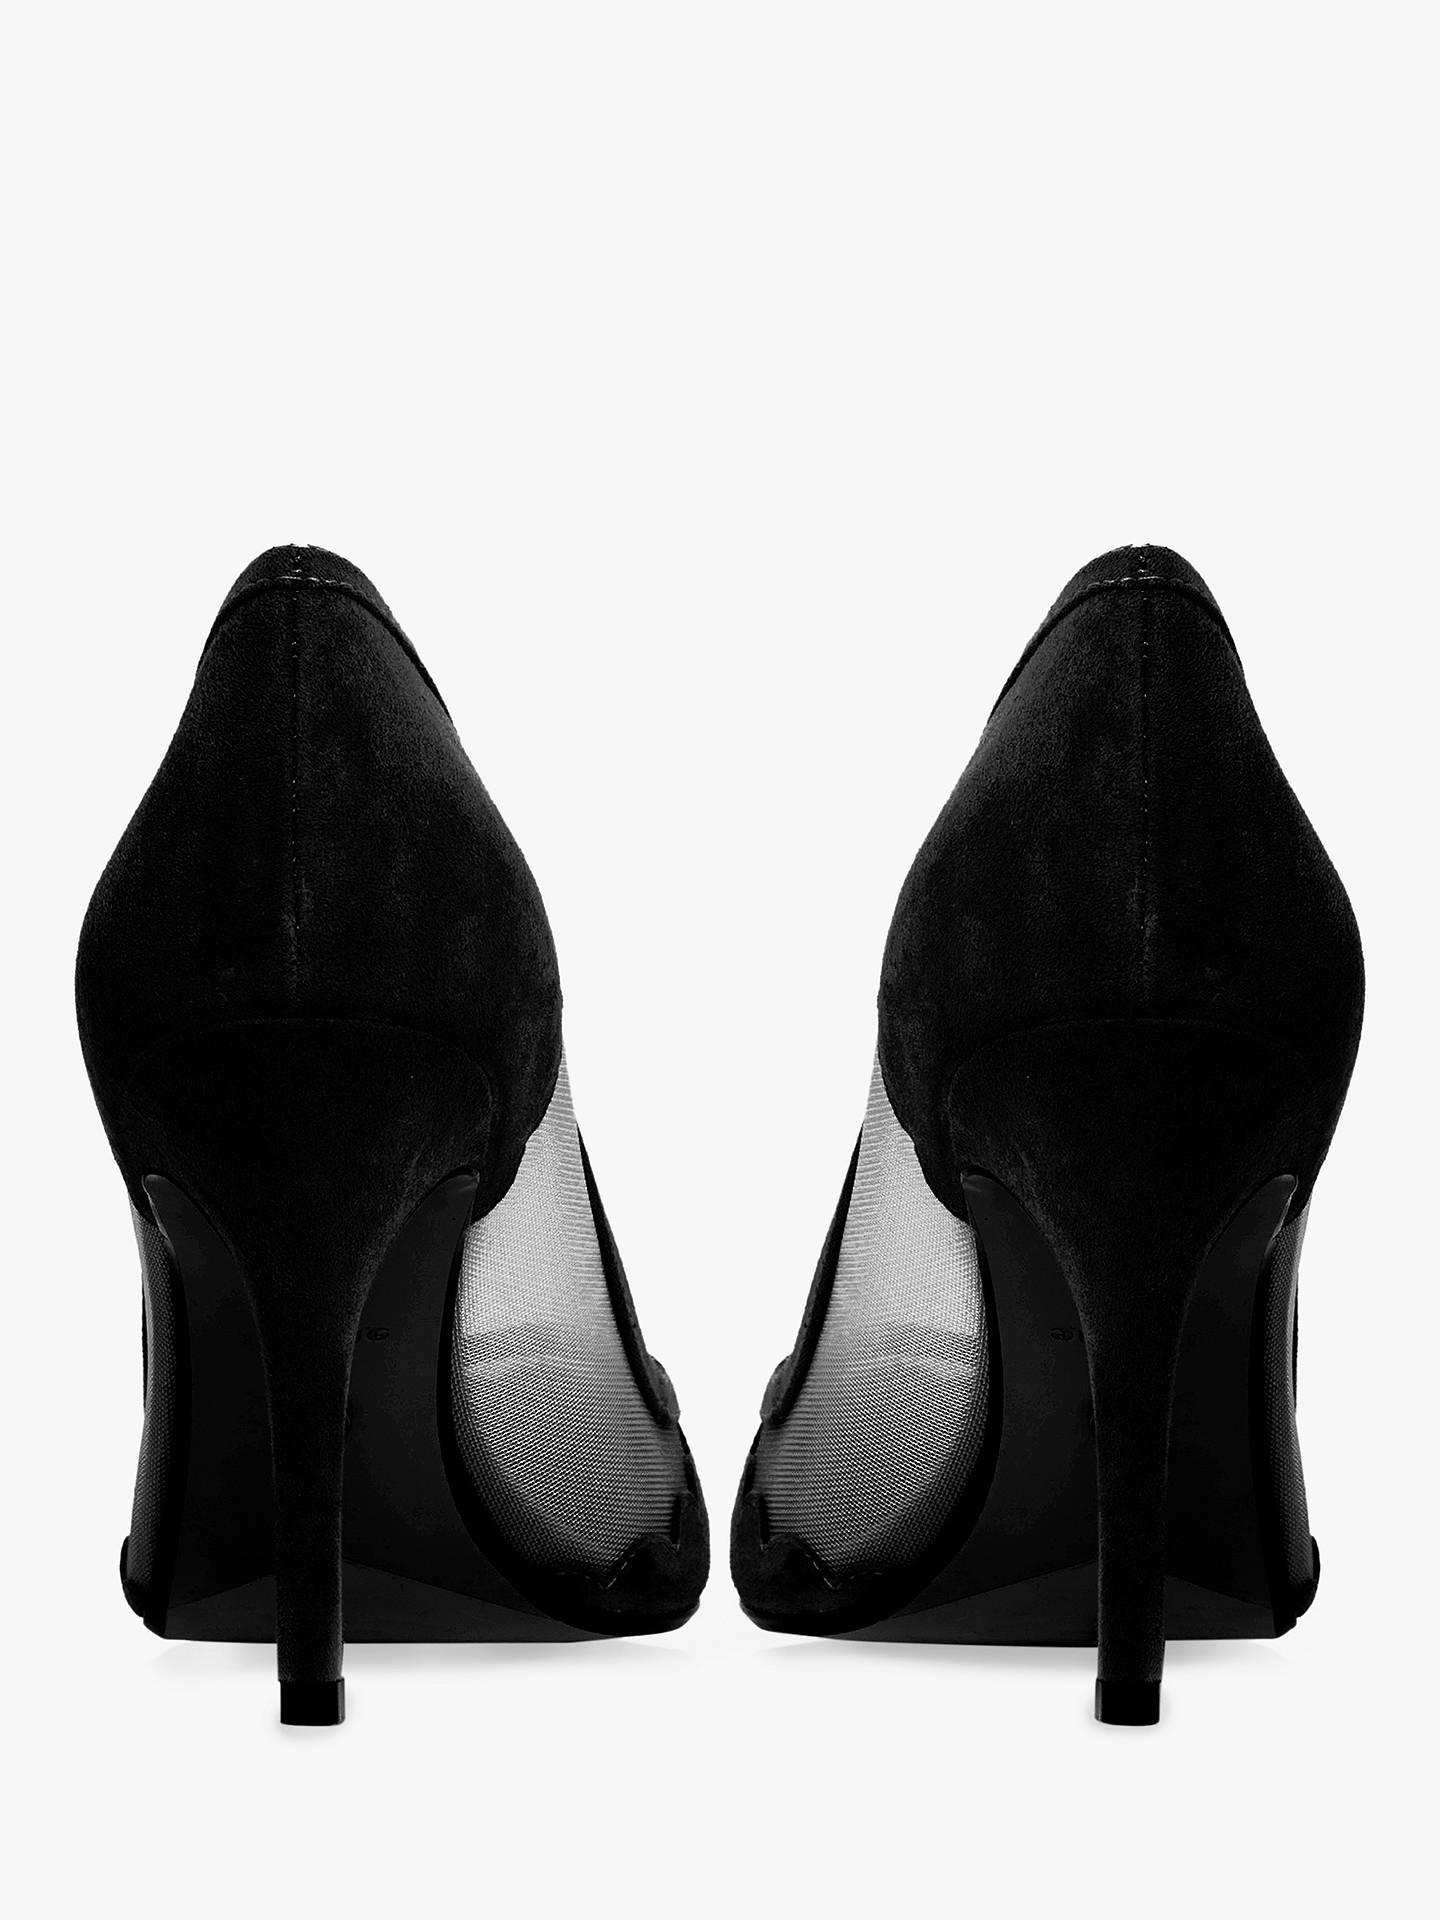 0d7198ca4f6 Dune Bellevue Semi Sheer Court Shoes, Black Suede